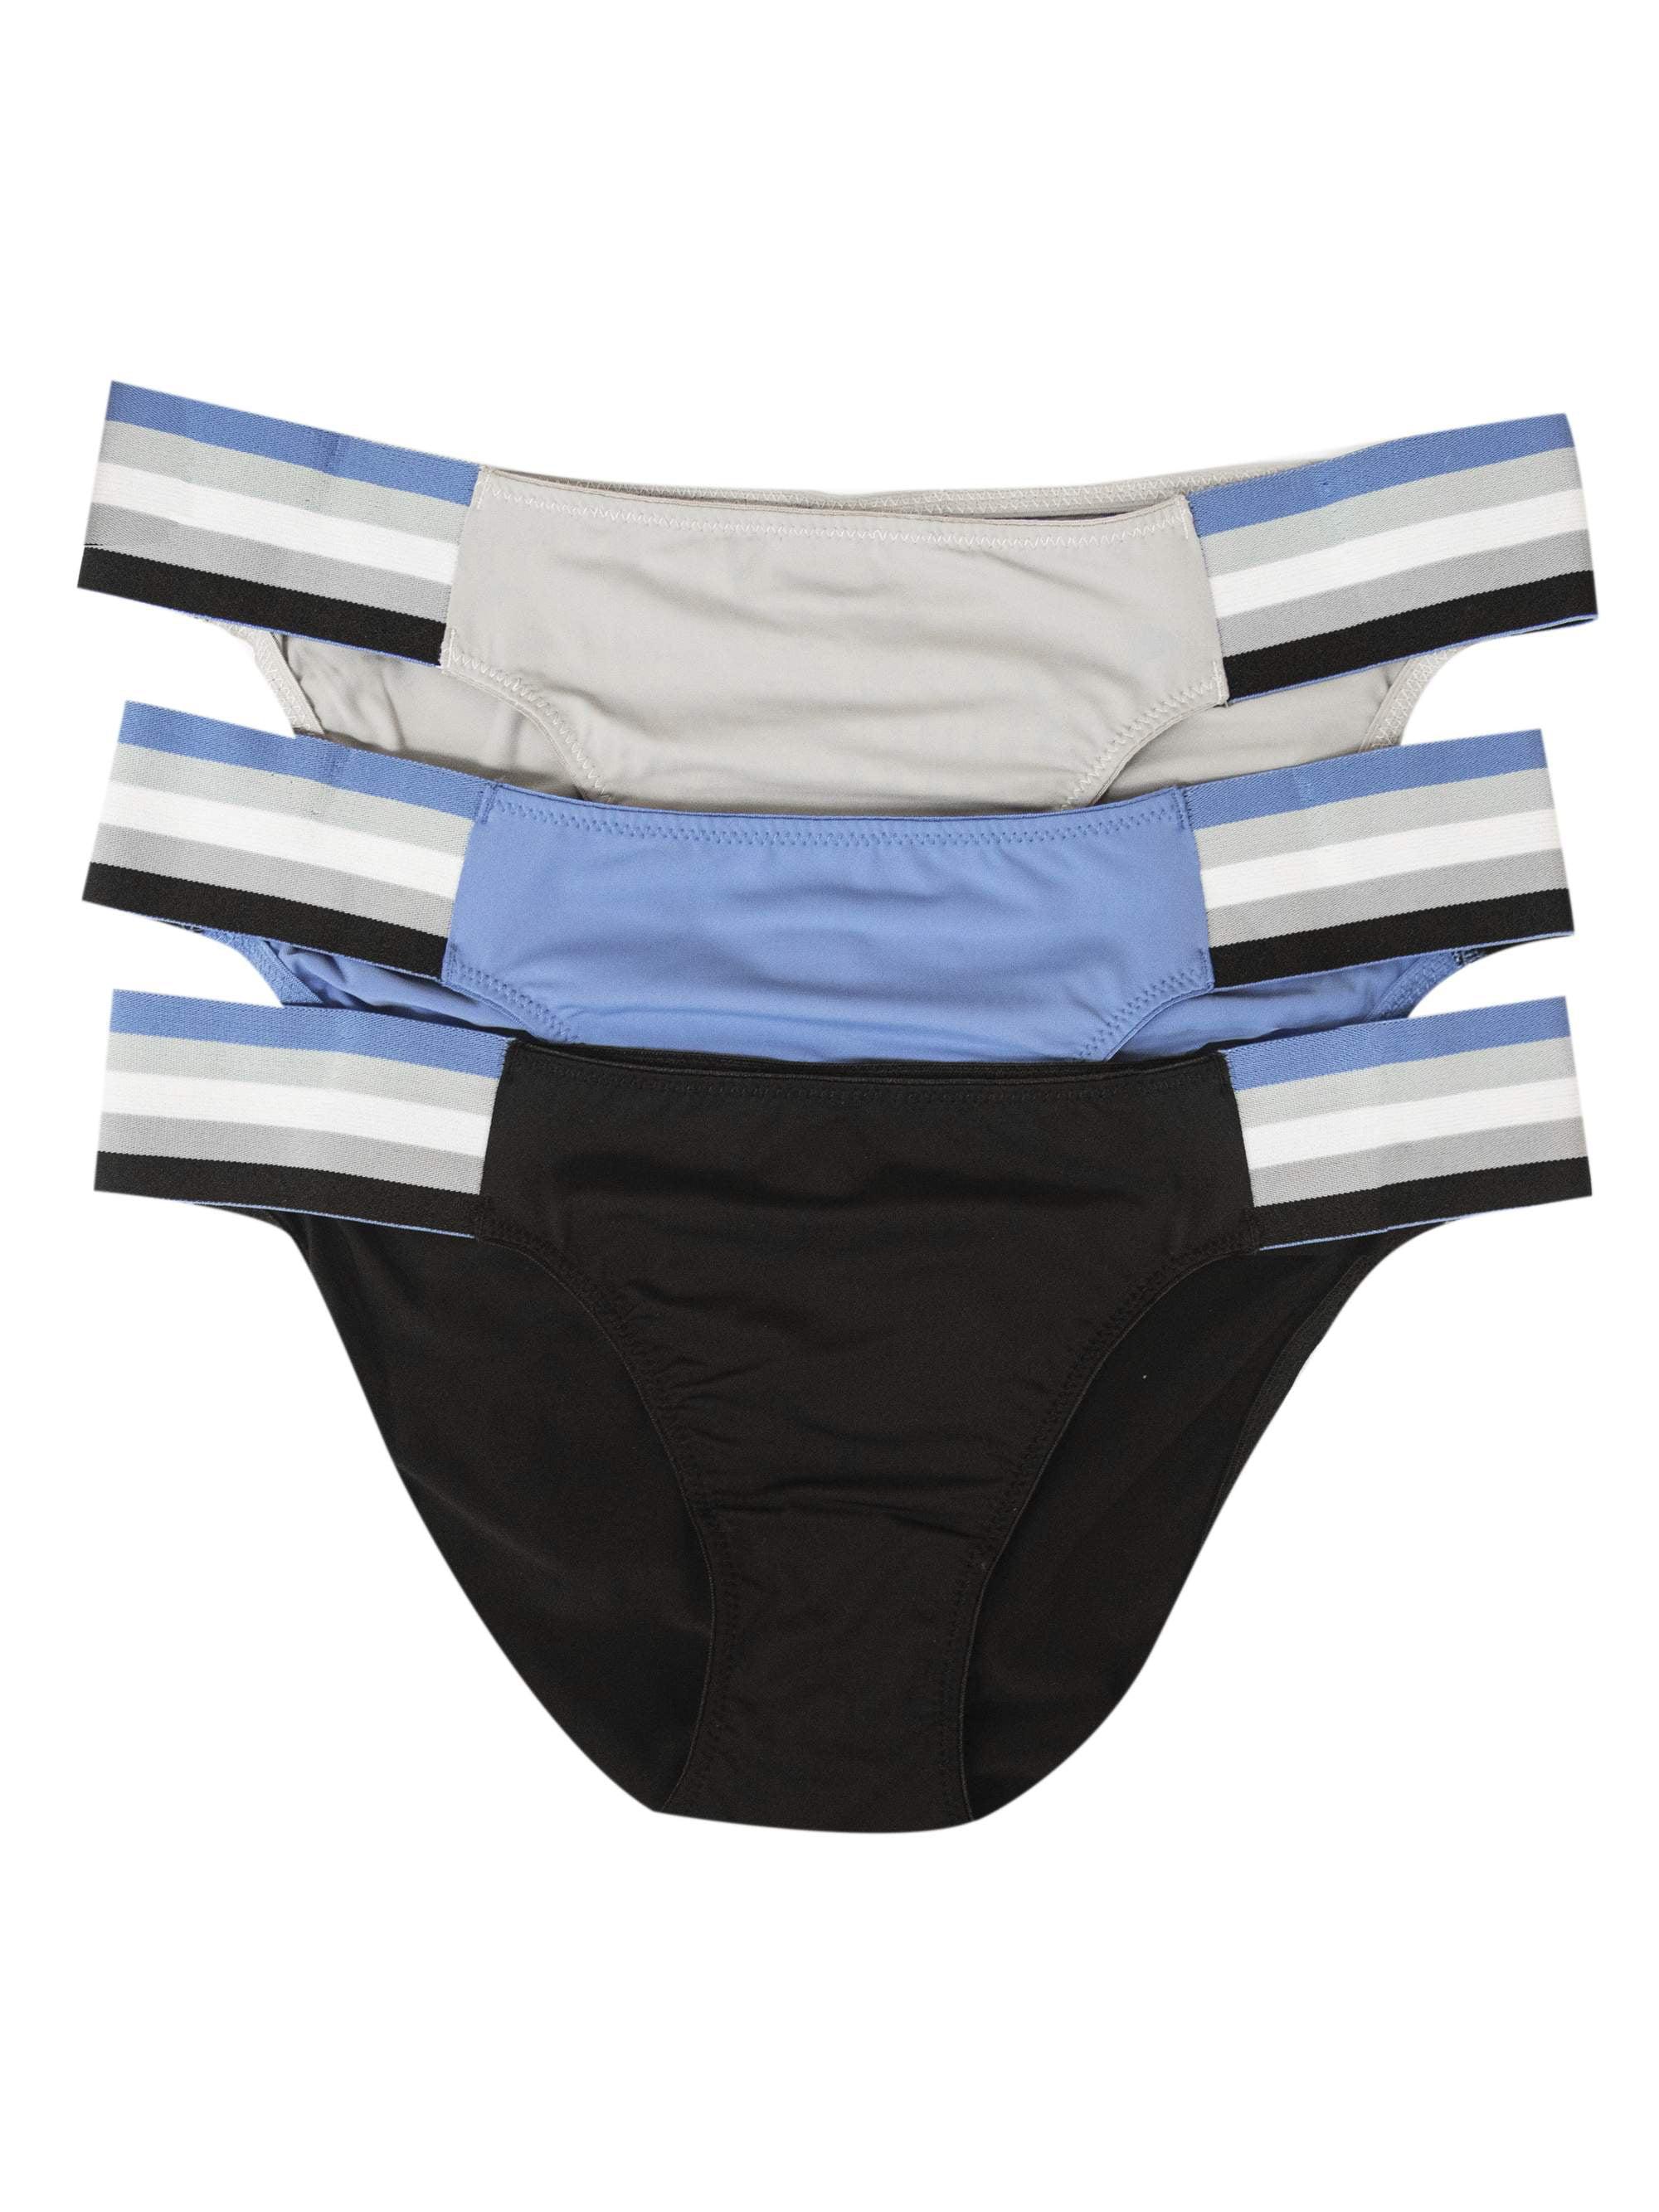 19ae6fa7a86f RBX - Women's Athletic Microfiber Bikini Panties - 3 Pack - Walmart.com